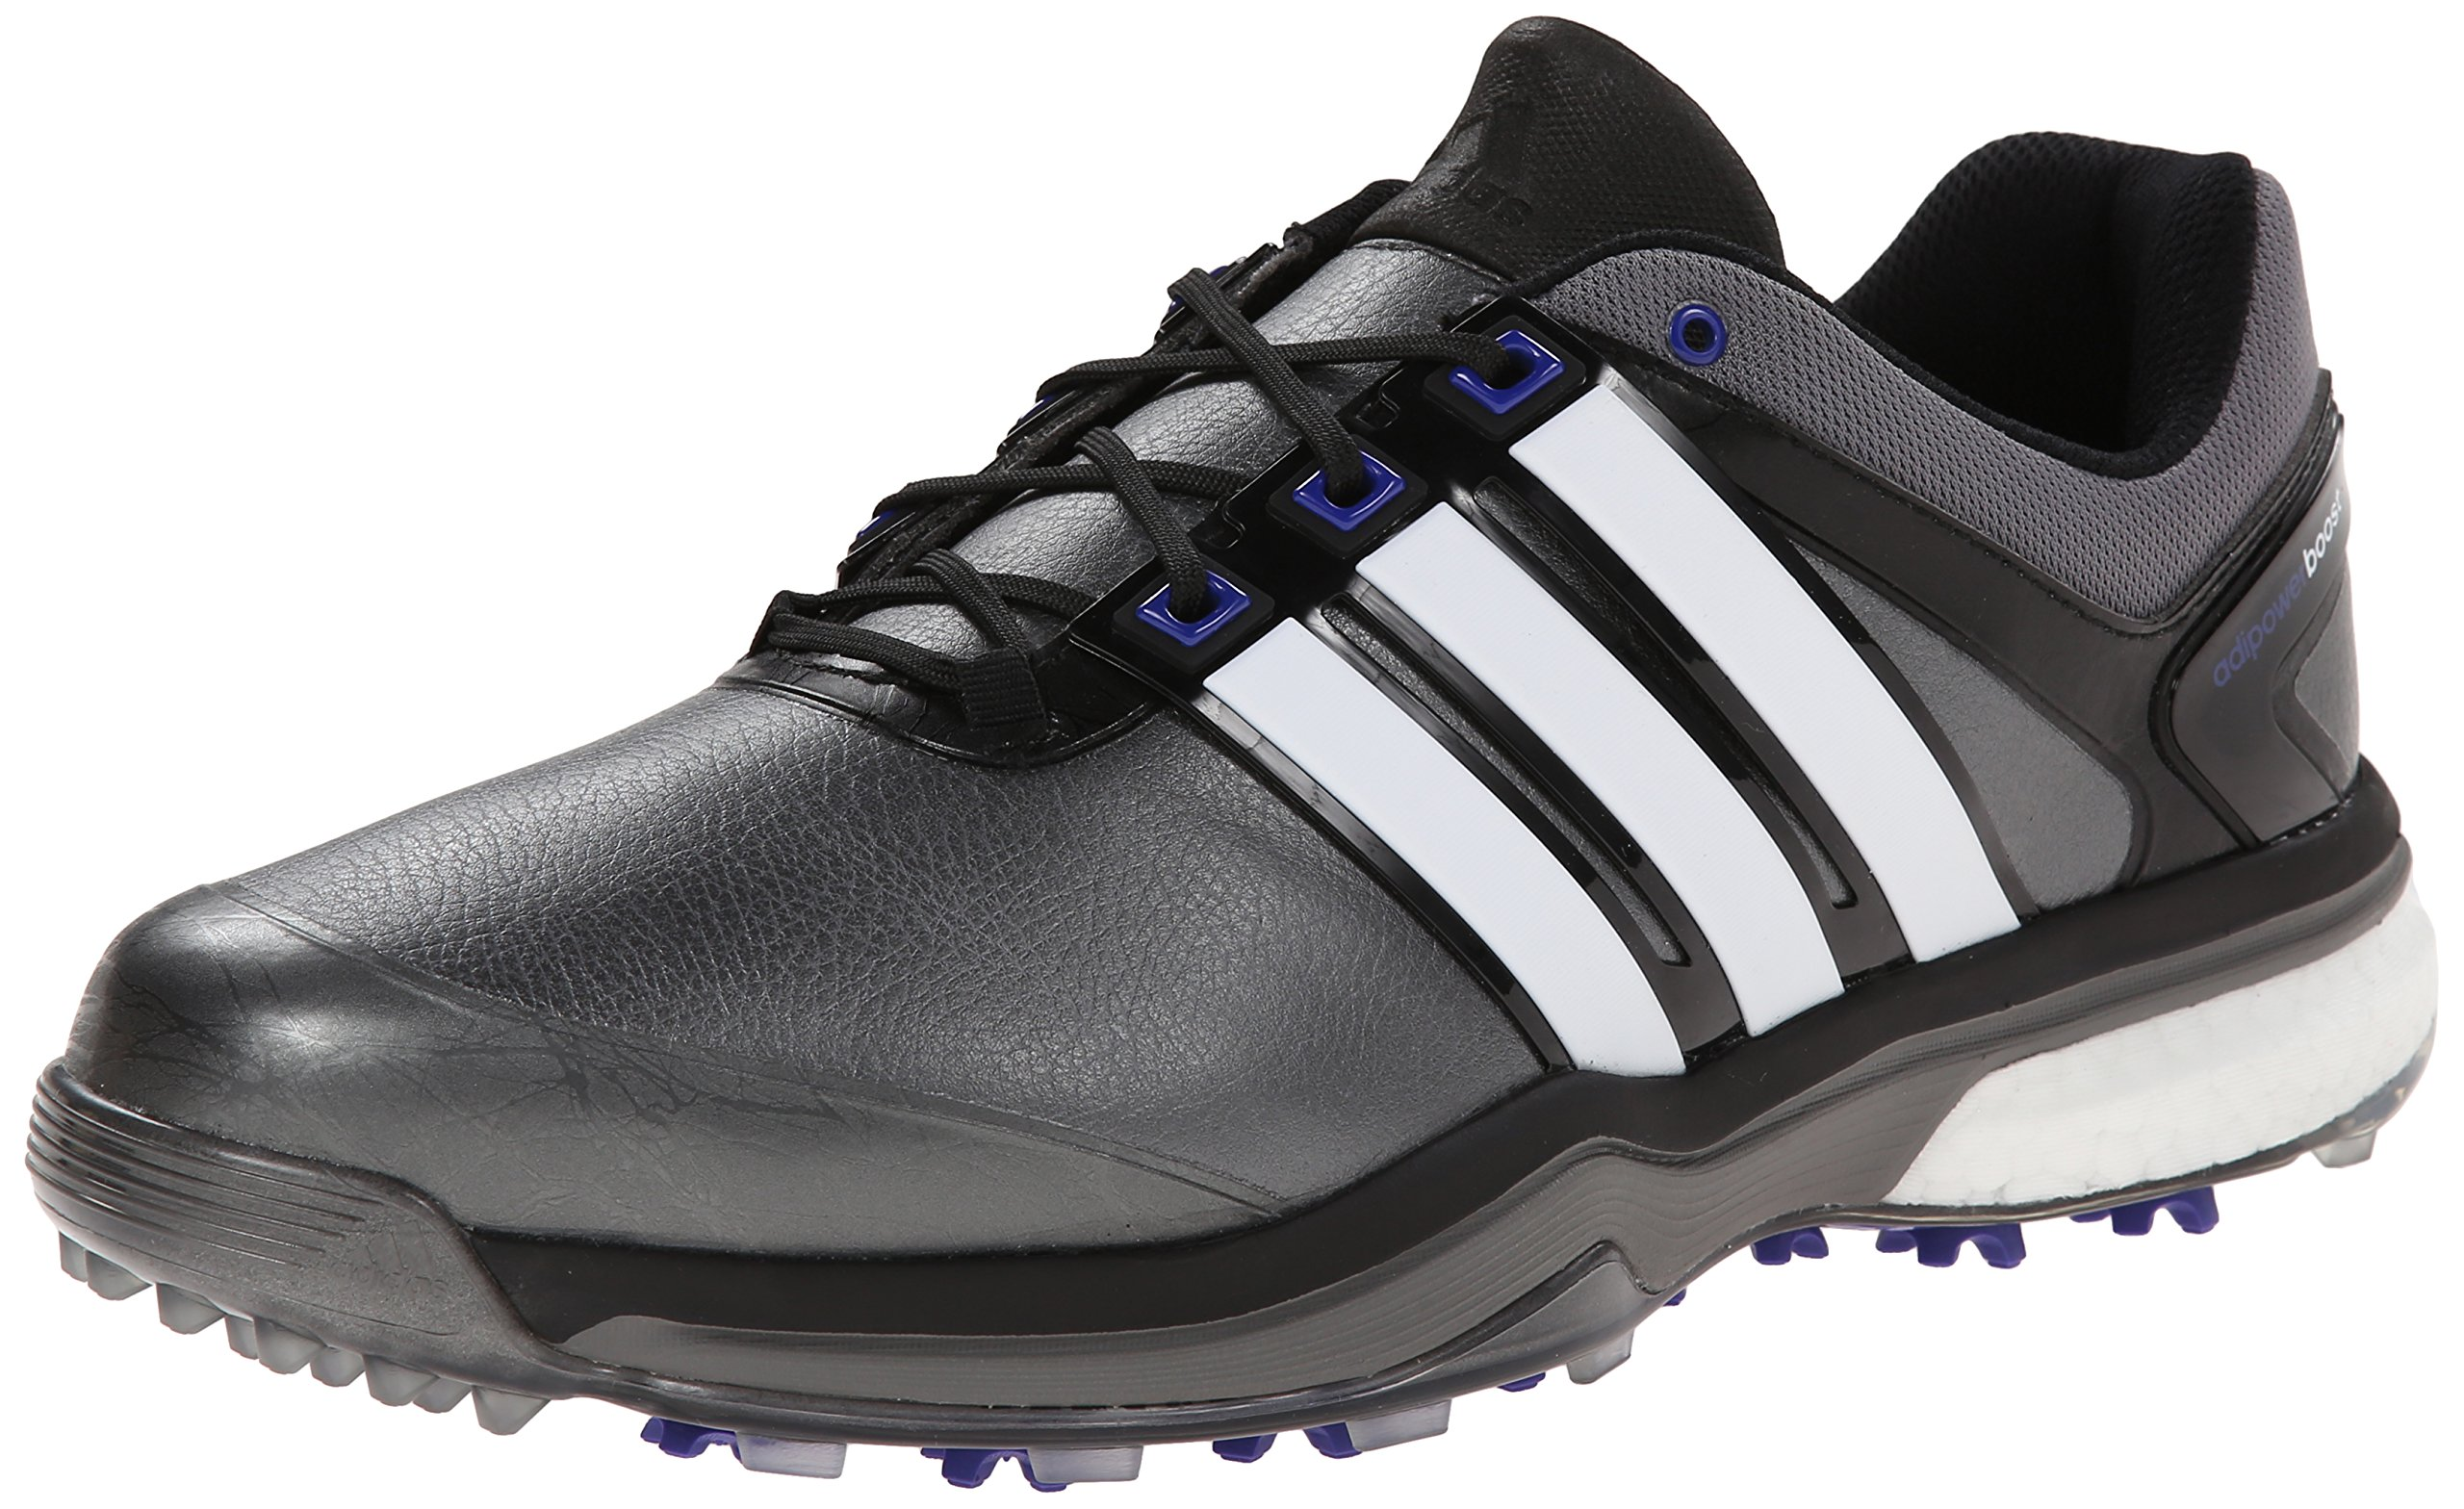 adidas Men's Adipower Boost Golf Shoe, Dark Silver Metallic/Running White/Night Flash, 7.5 E US